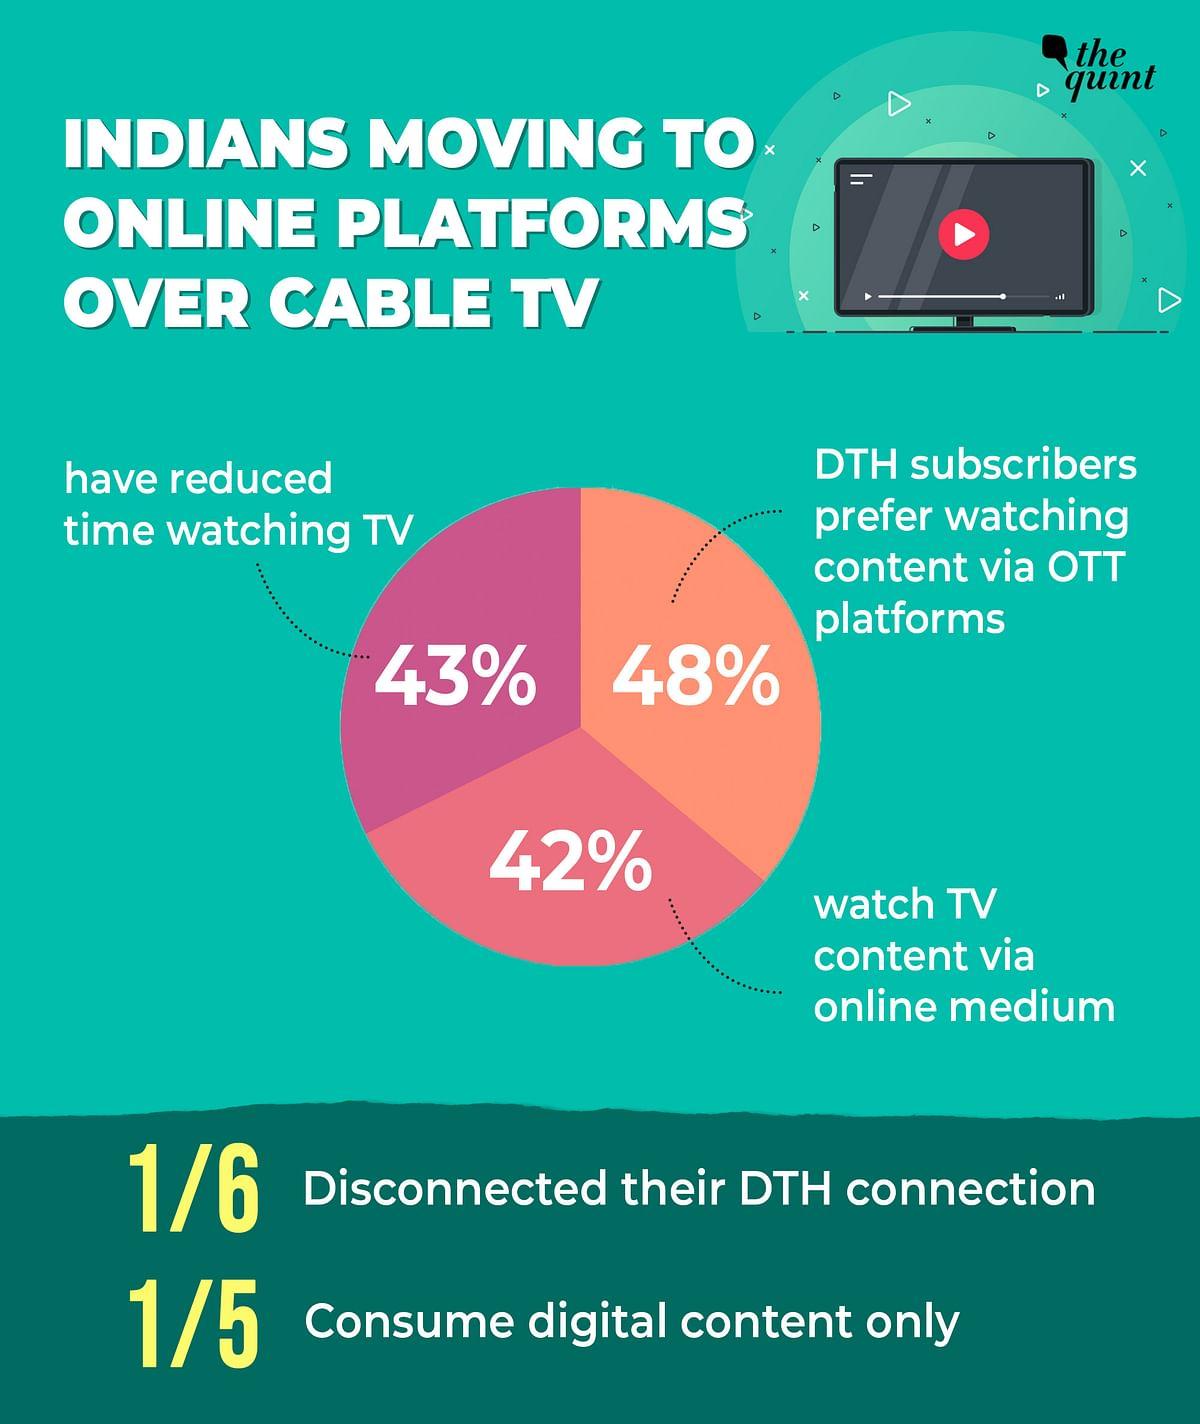 TRAI's Cable Tariff Hike Pushes Indians Towards Hotstar & Netflix